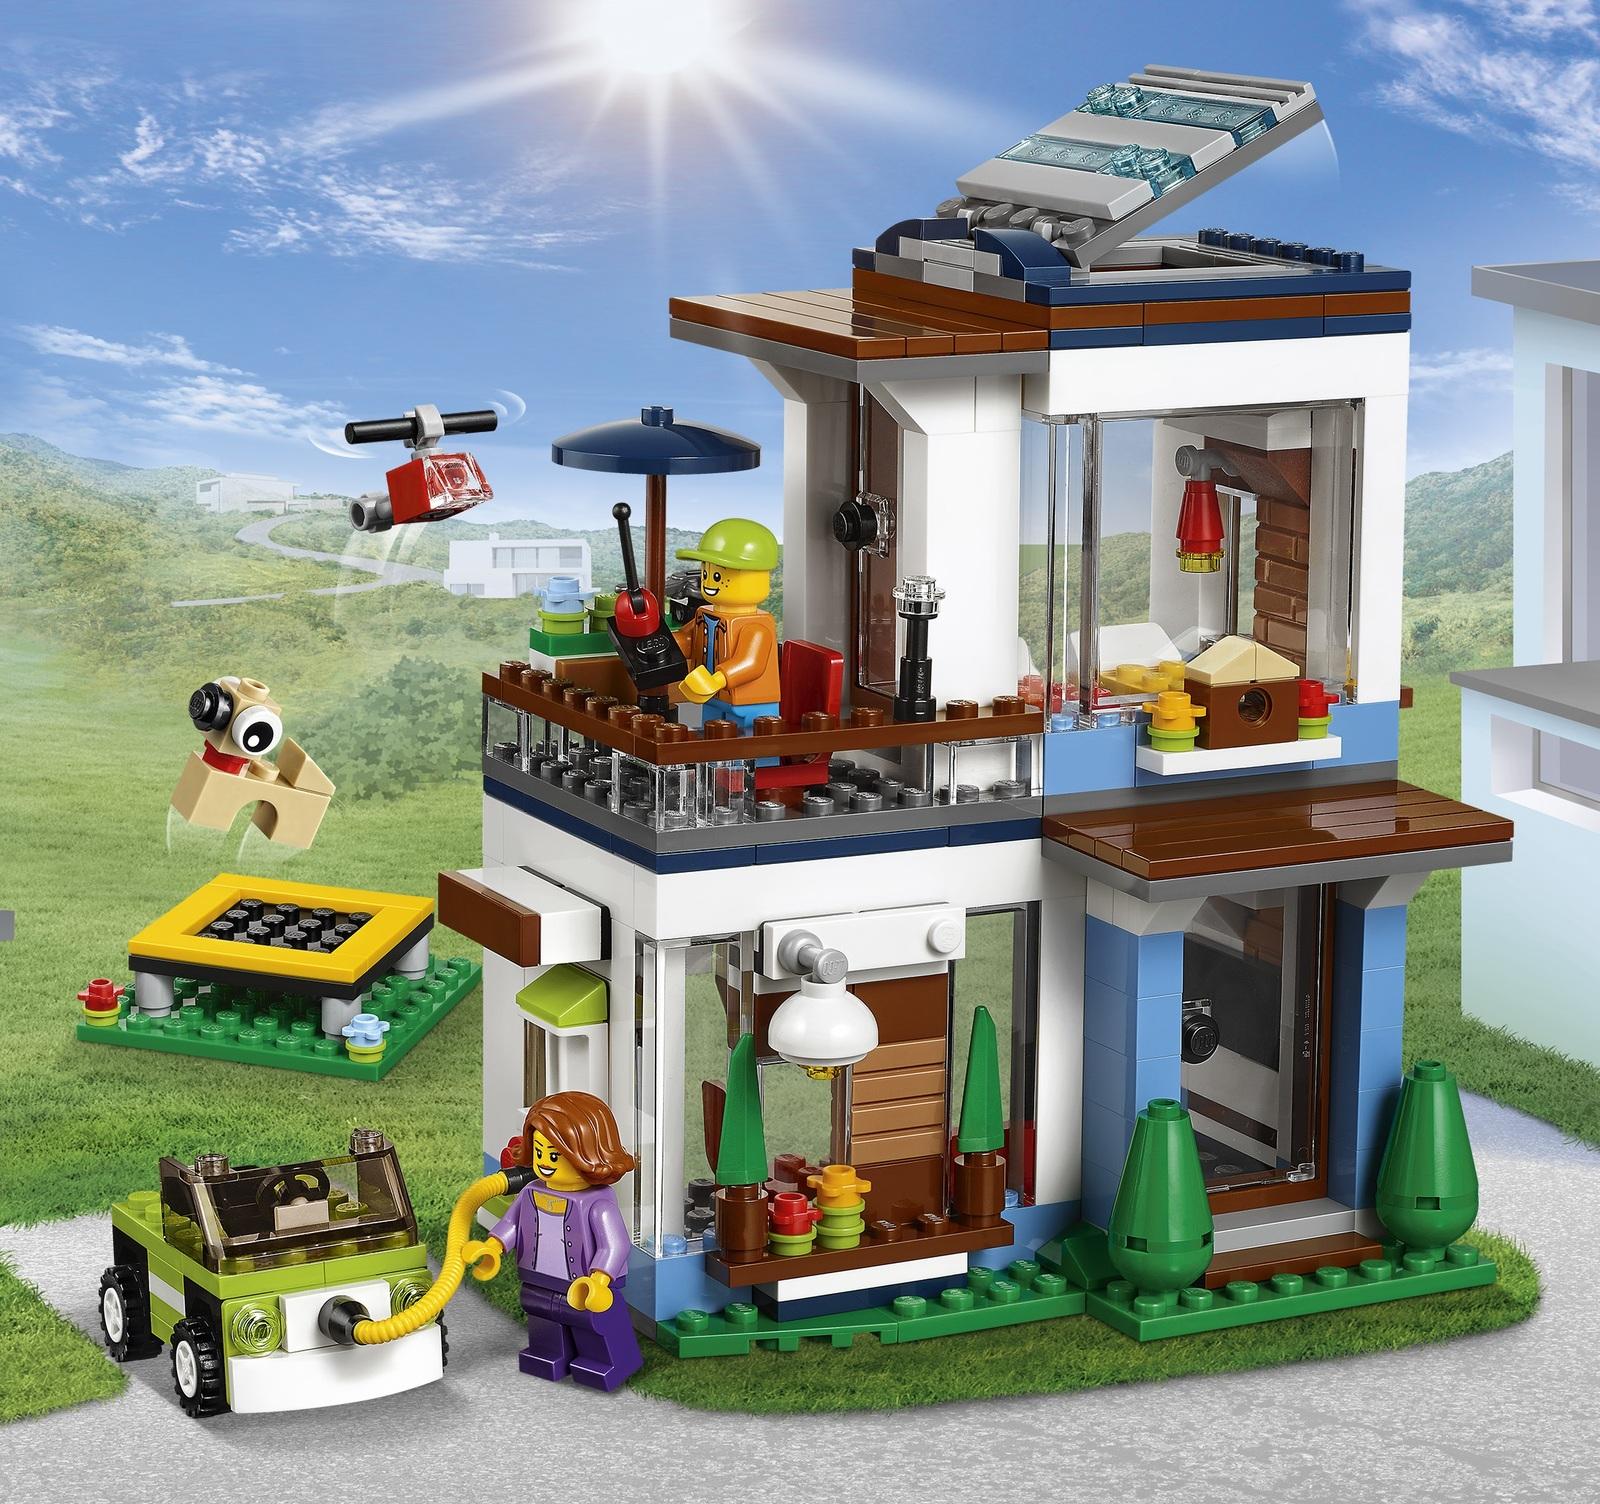 LEGO Creator - Modern Home (31068) image